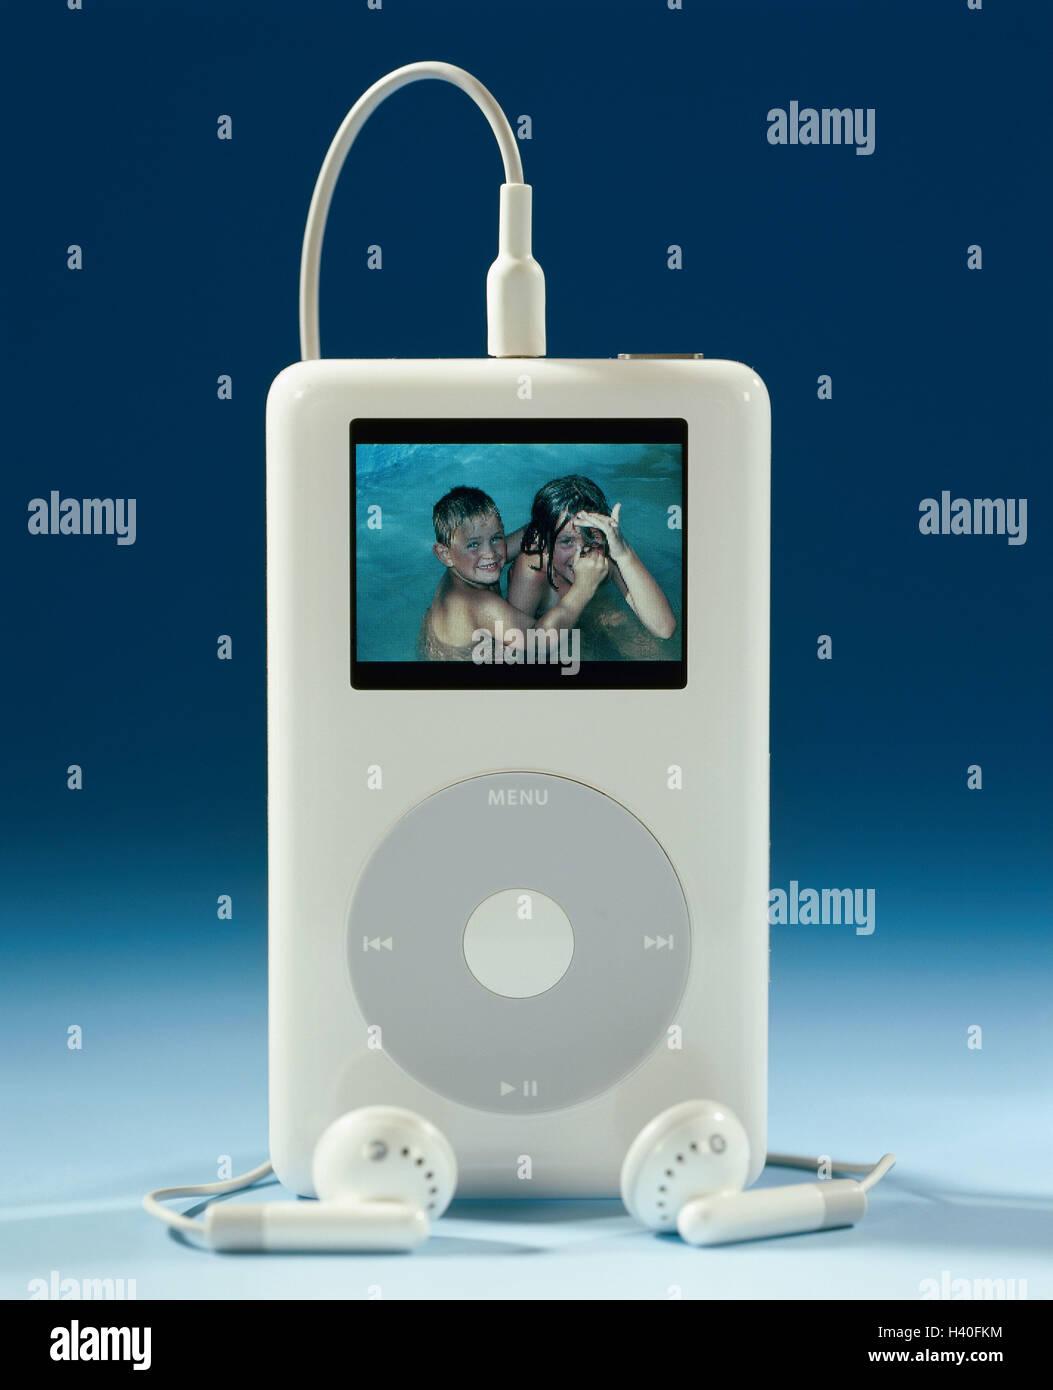 MP3-Player, Apple iPod photo, Display, Kinderfoto, no